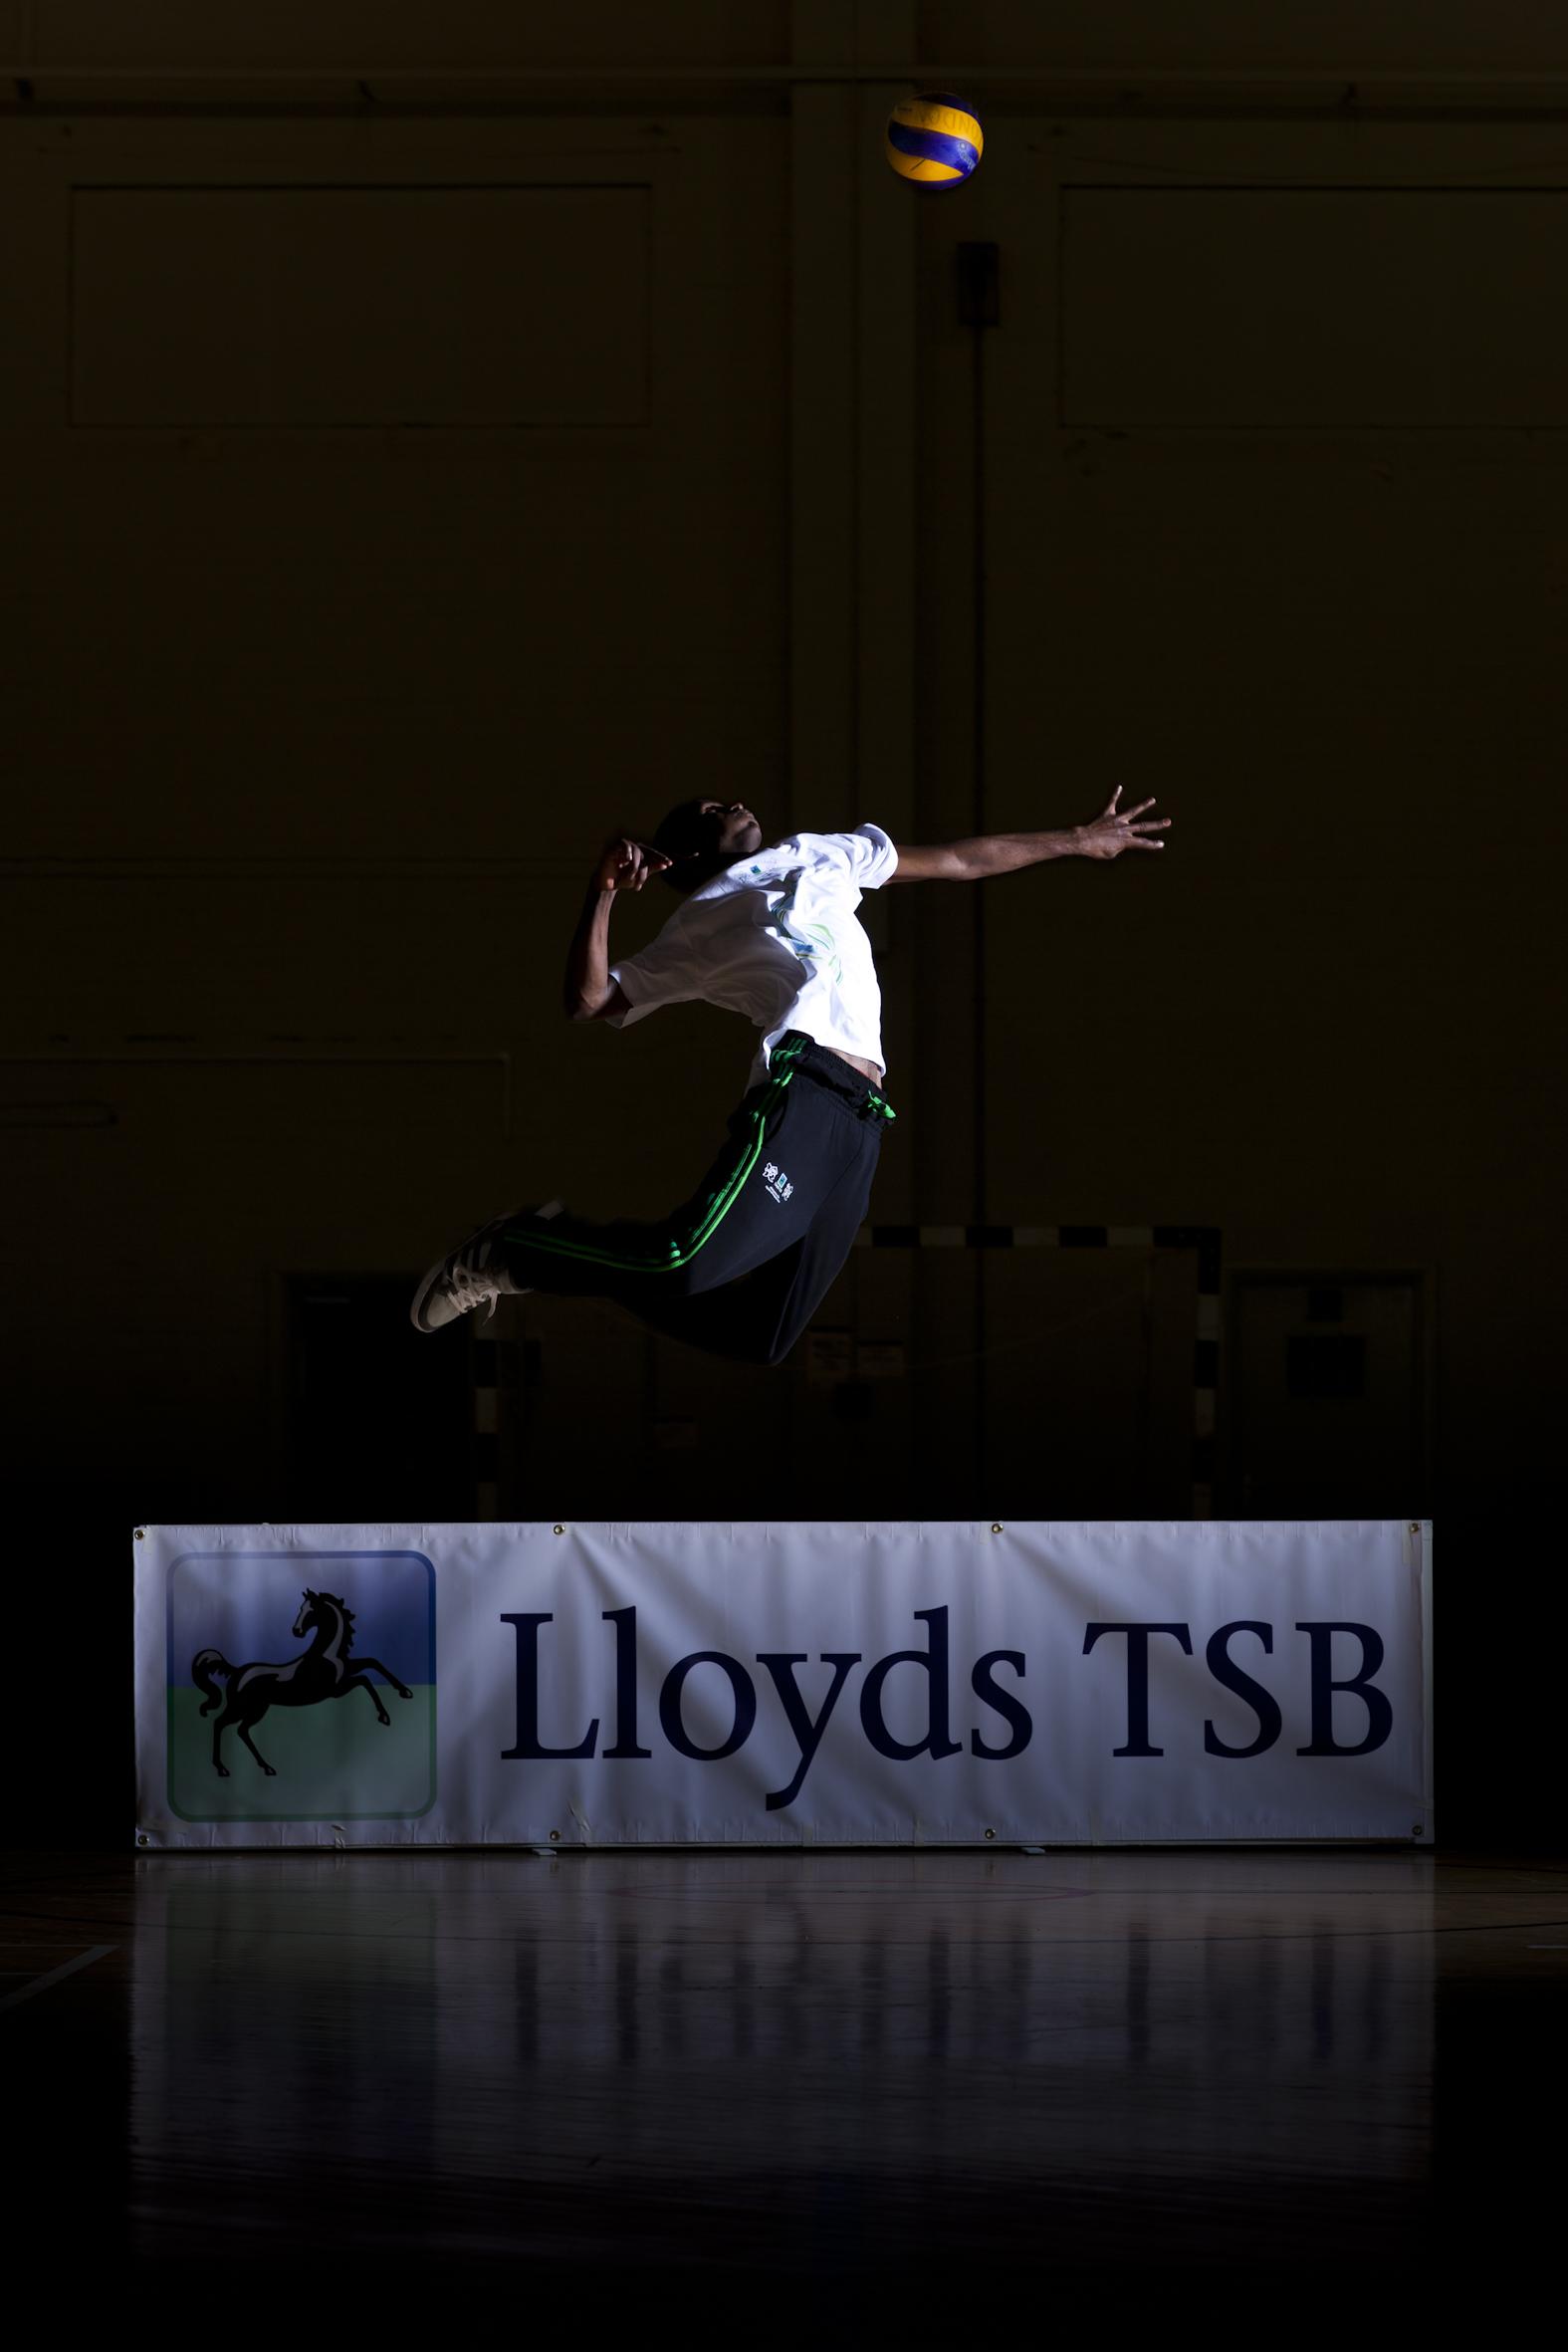 Lloyds_TSB_with_badminton_player